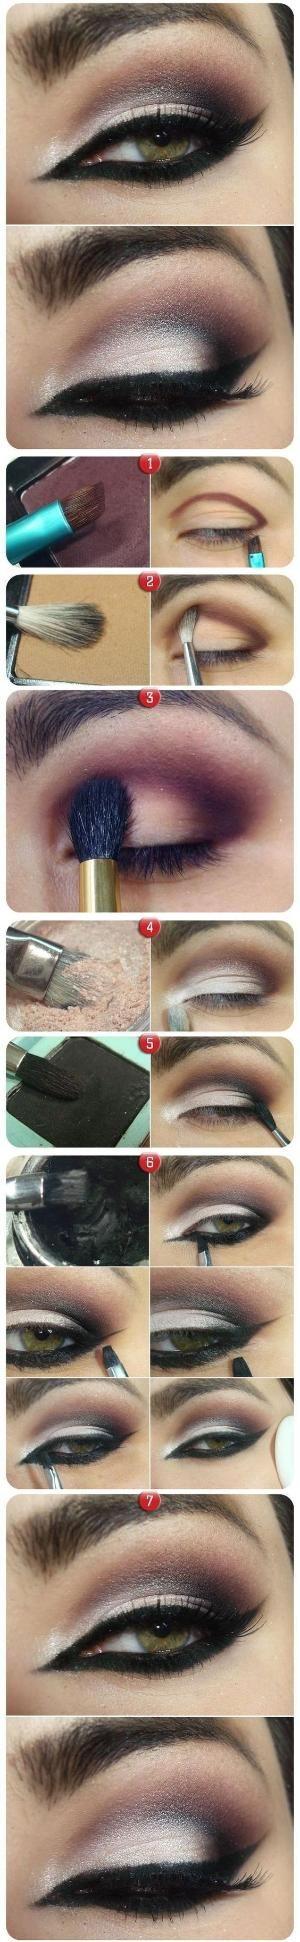 Step By Step Smokey Eye Makeup Tutorials by jessicaj